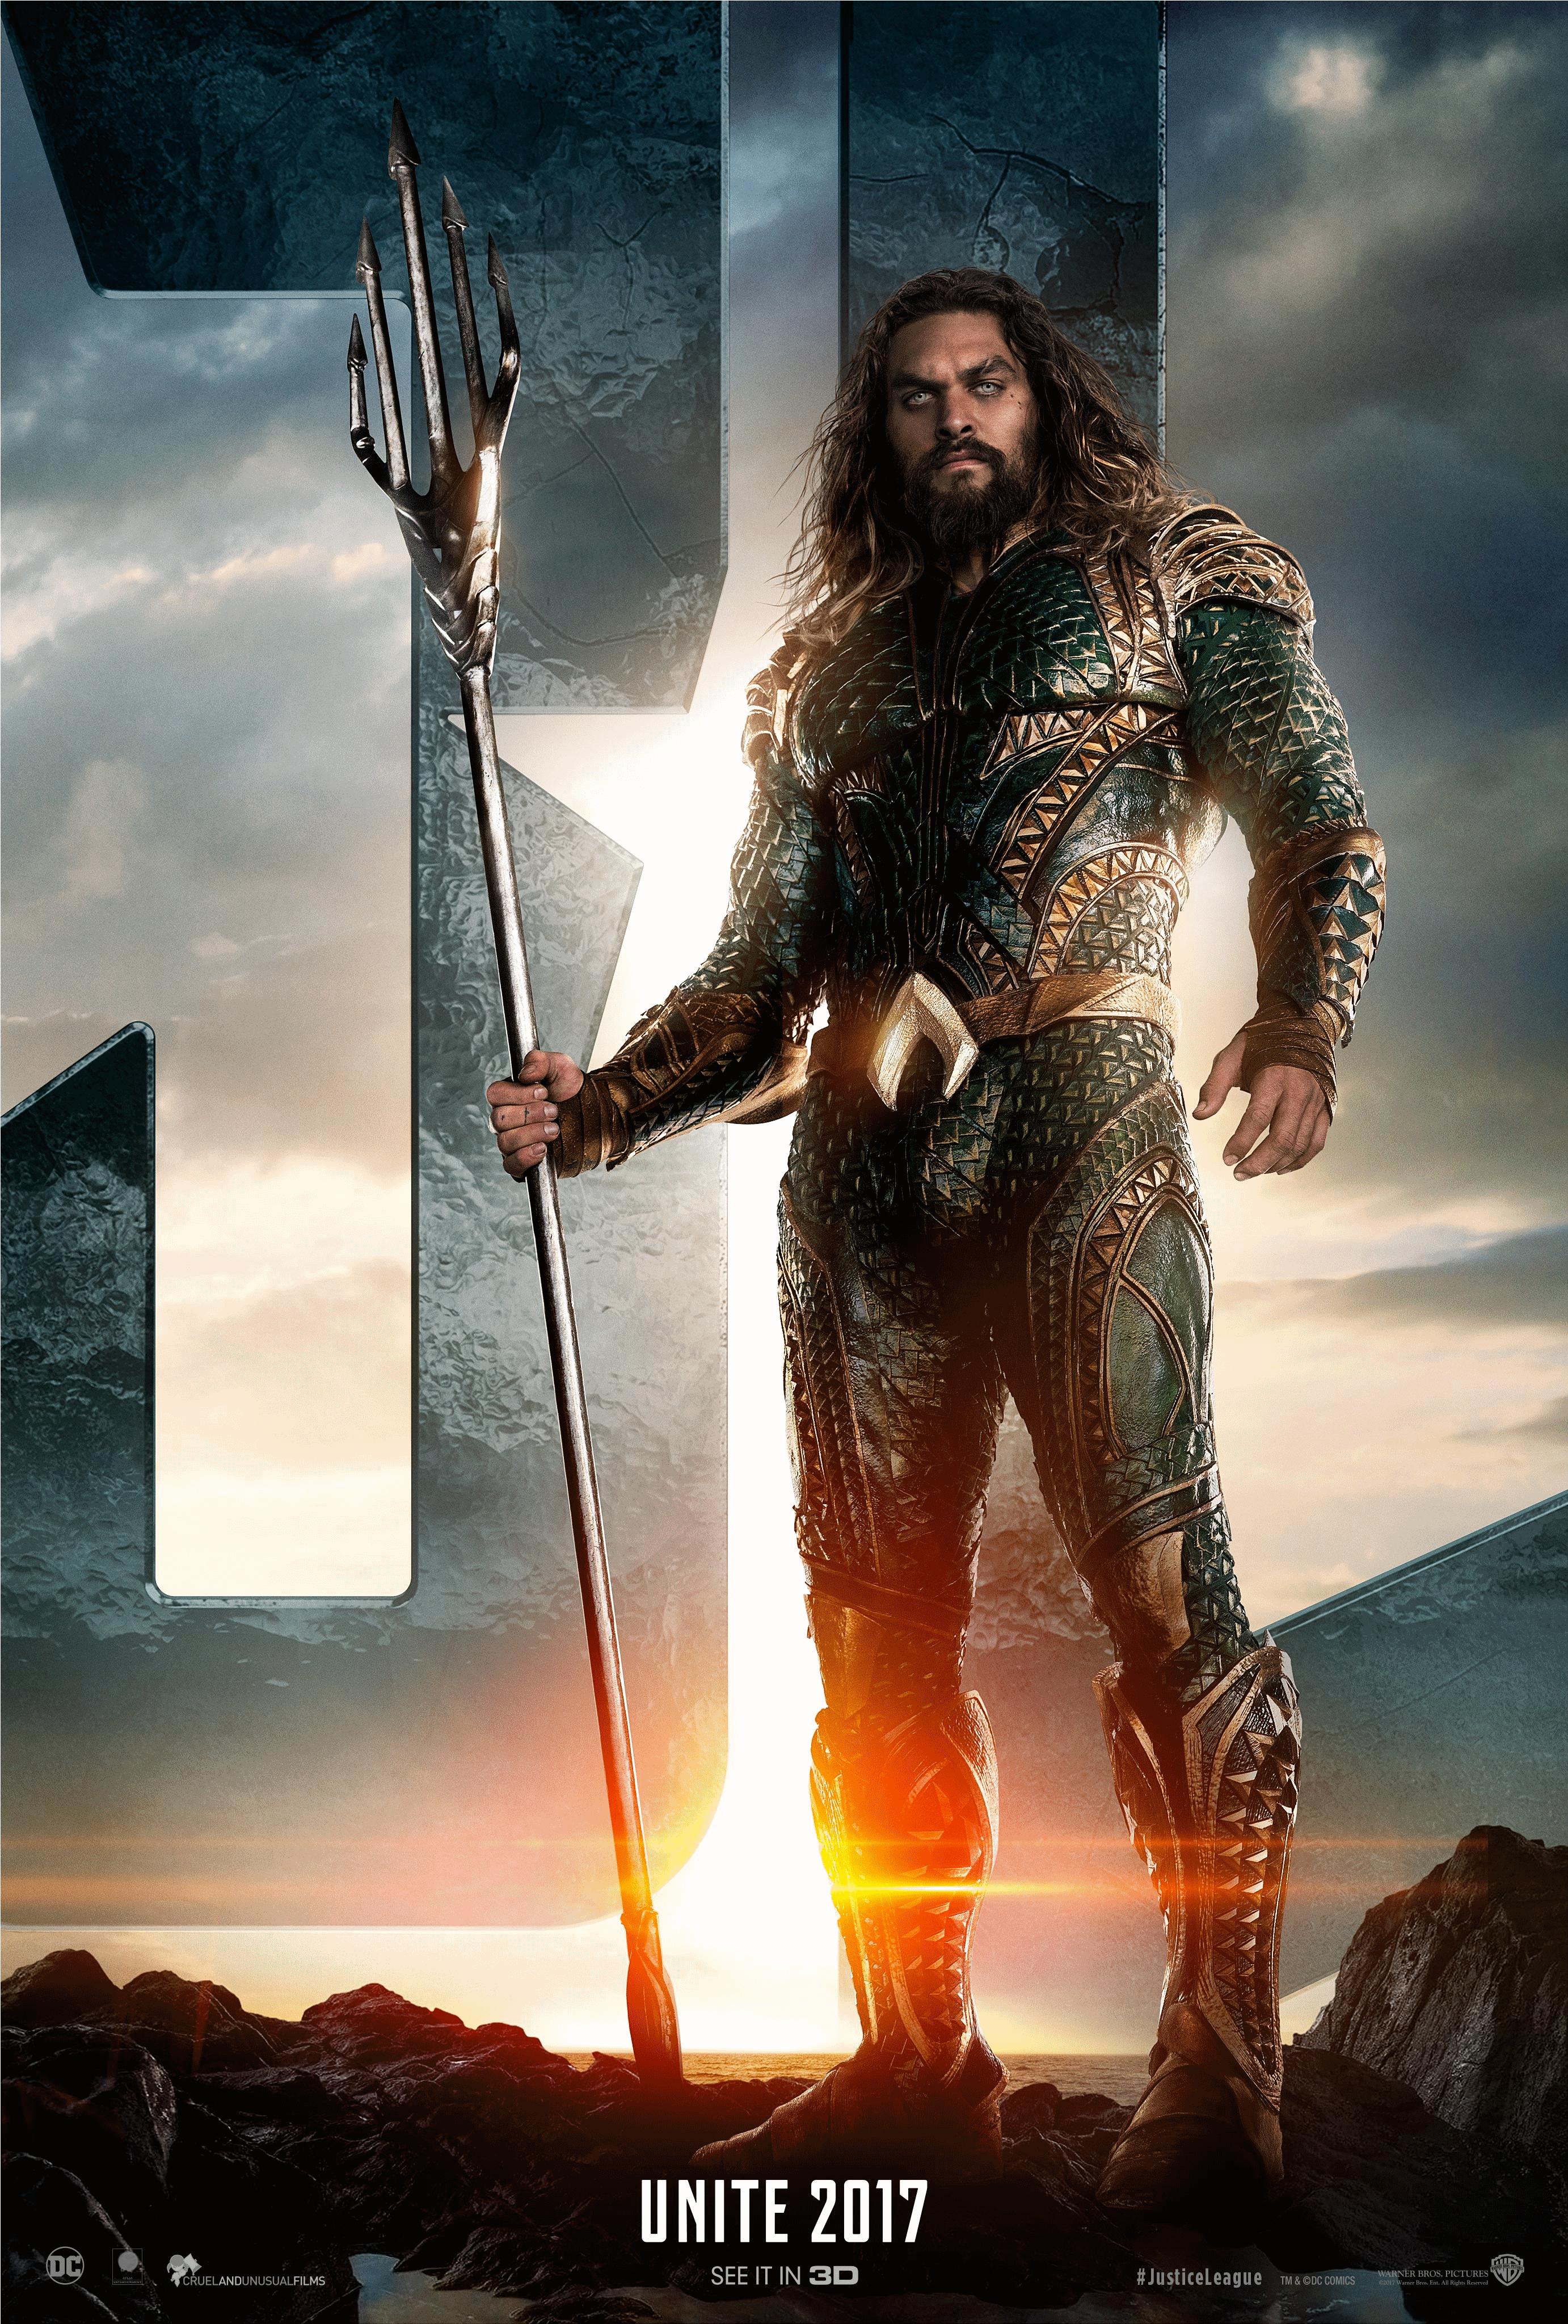 Jl Poster2 Png Justice League Aquaman Jason Momoa Movies Aquaman